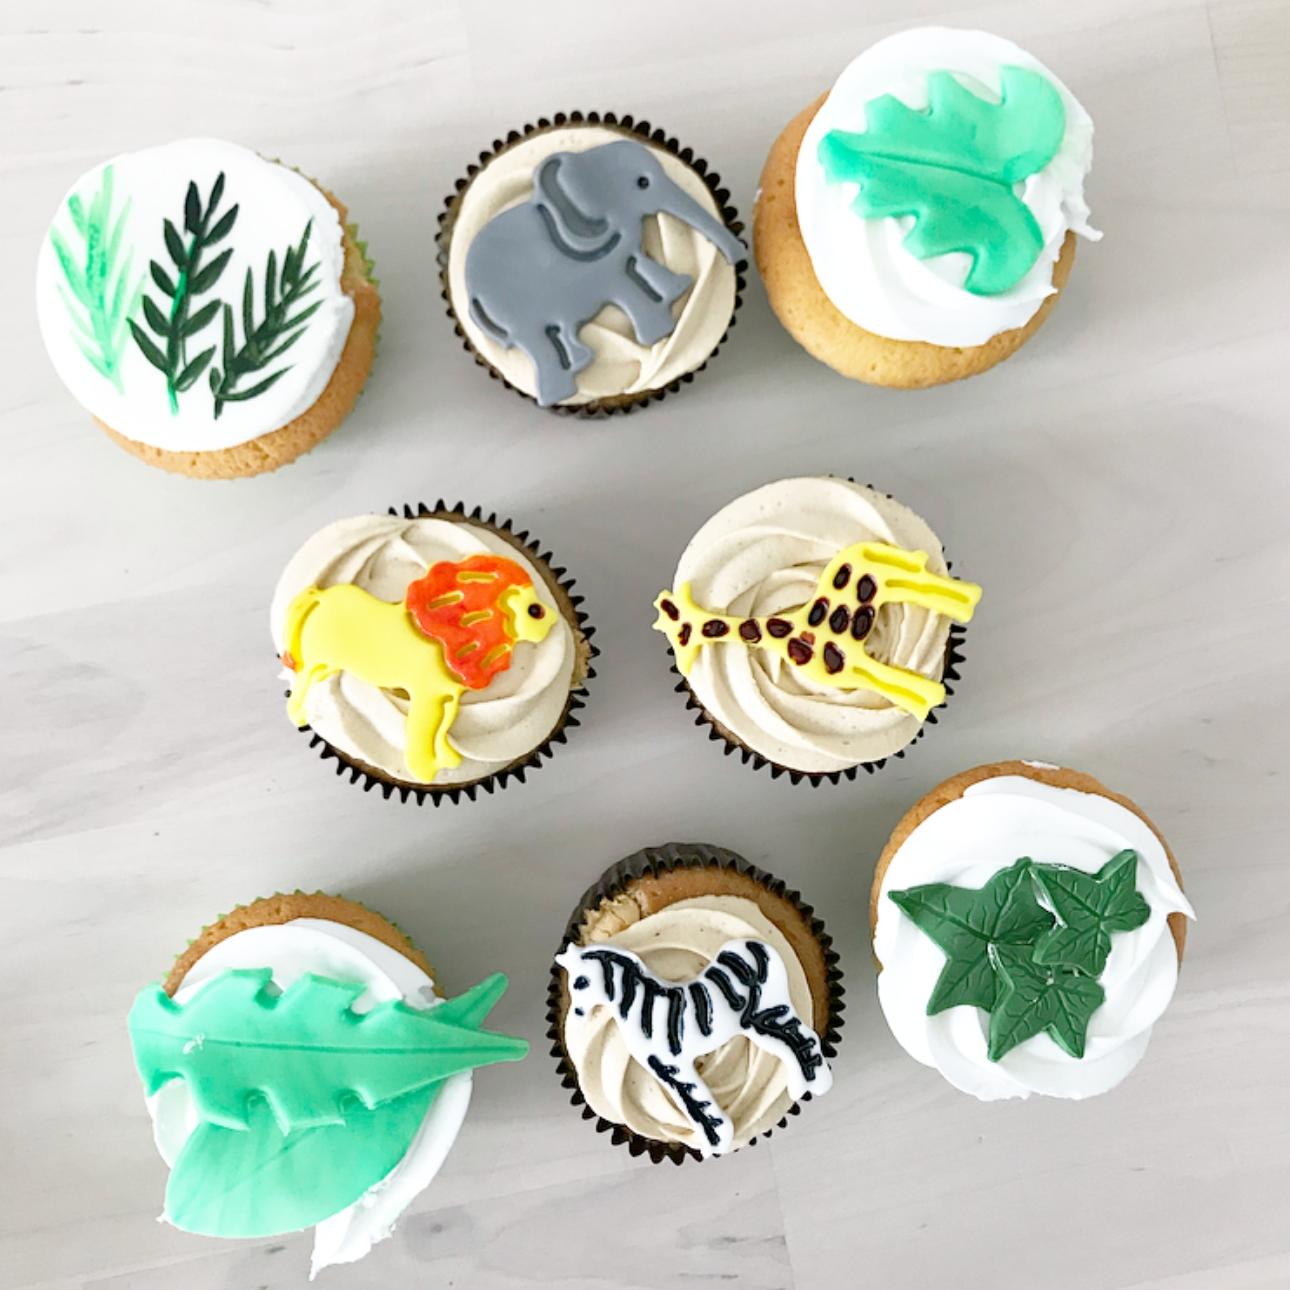 one wild year jungle party dieren cupcakes groen